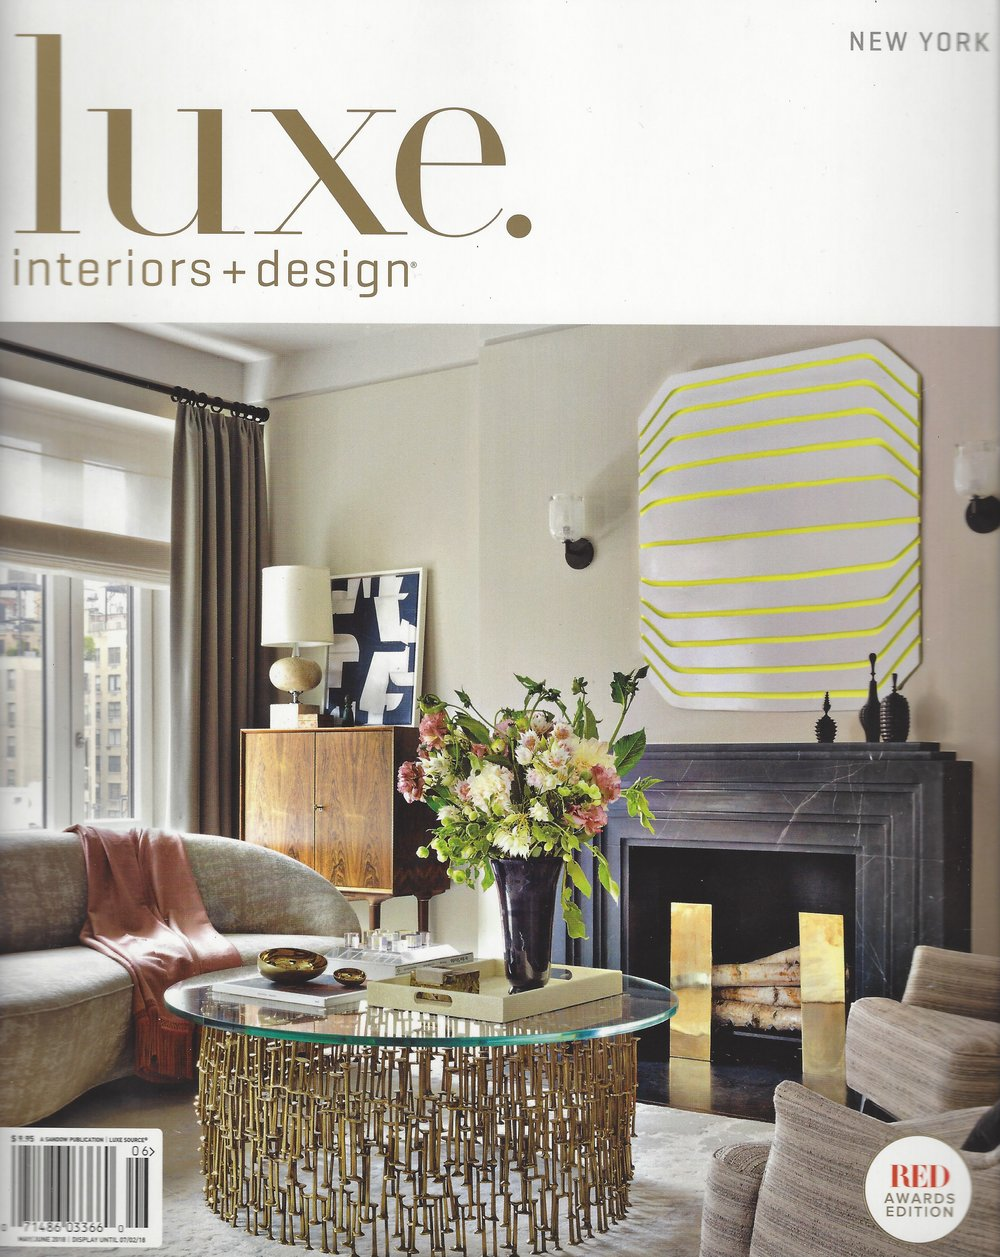 LuxeInteriors+Design_May_Jun18_Cover.jpeg